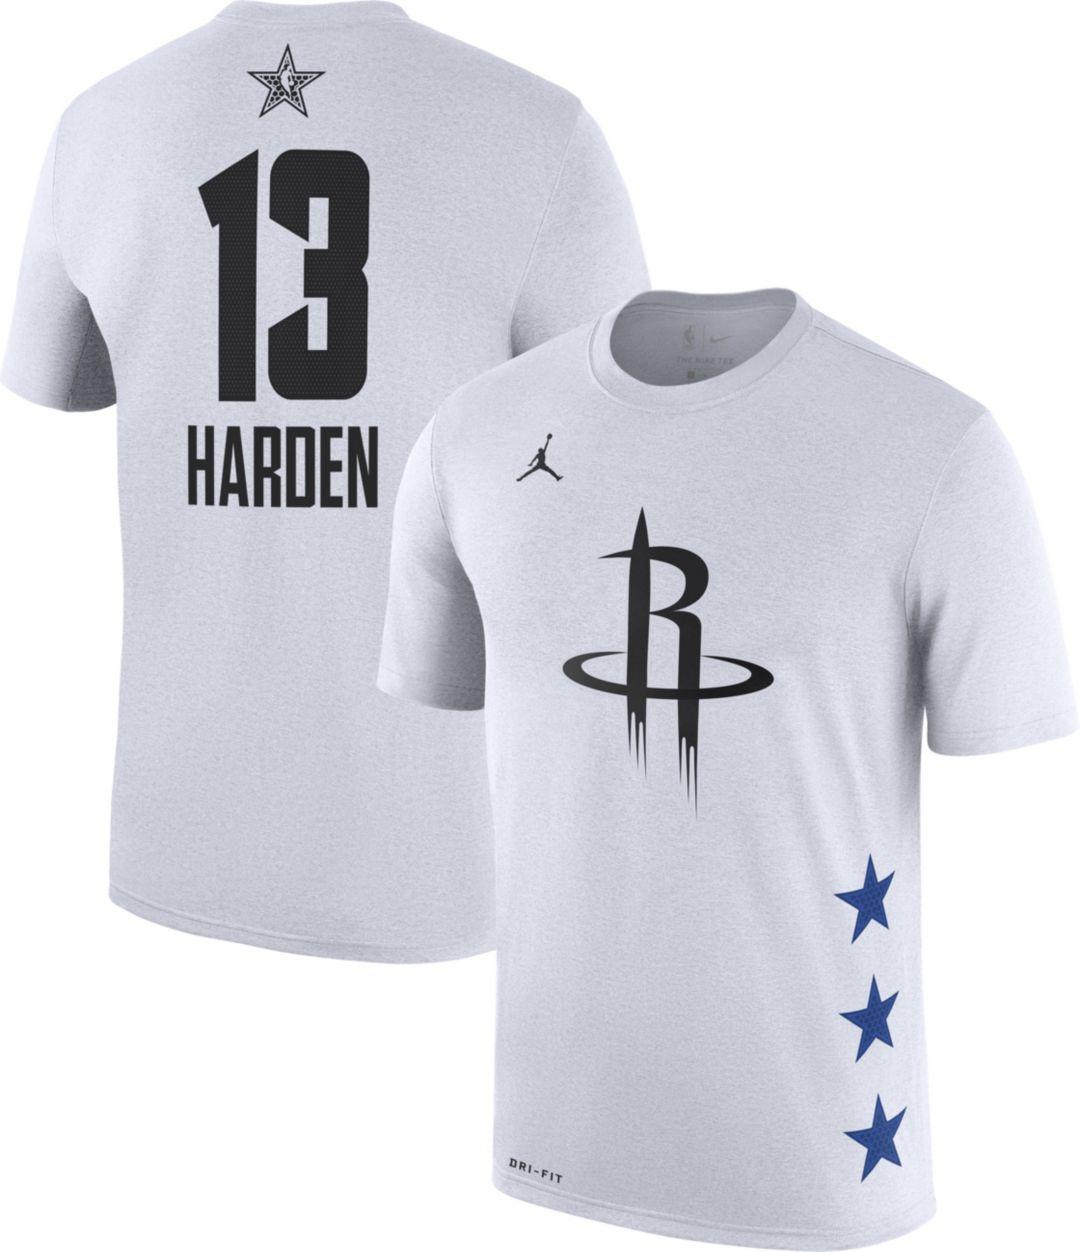 new style b19f7 3171f Jordan Men's 2019 NBA All-Star Game James Harden Dri-FIT White T-Shirt